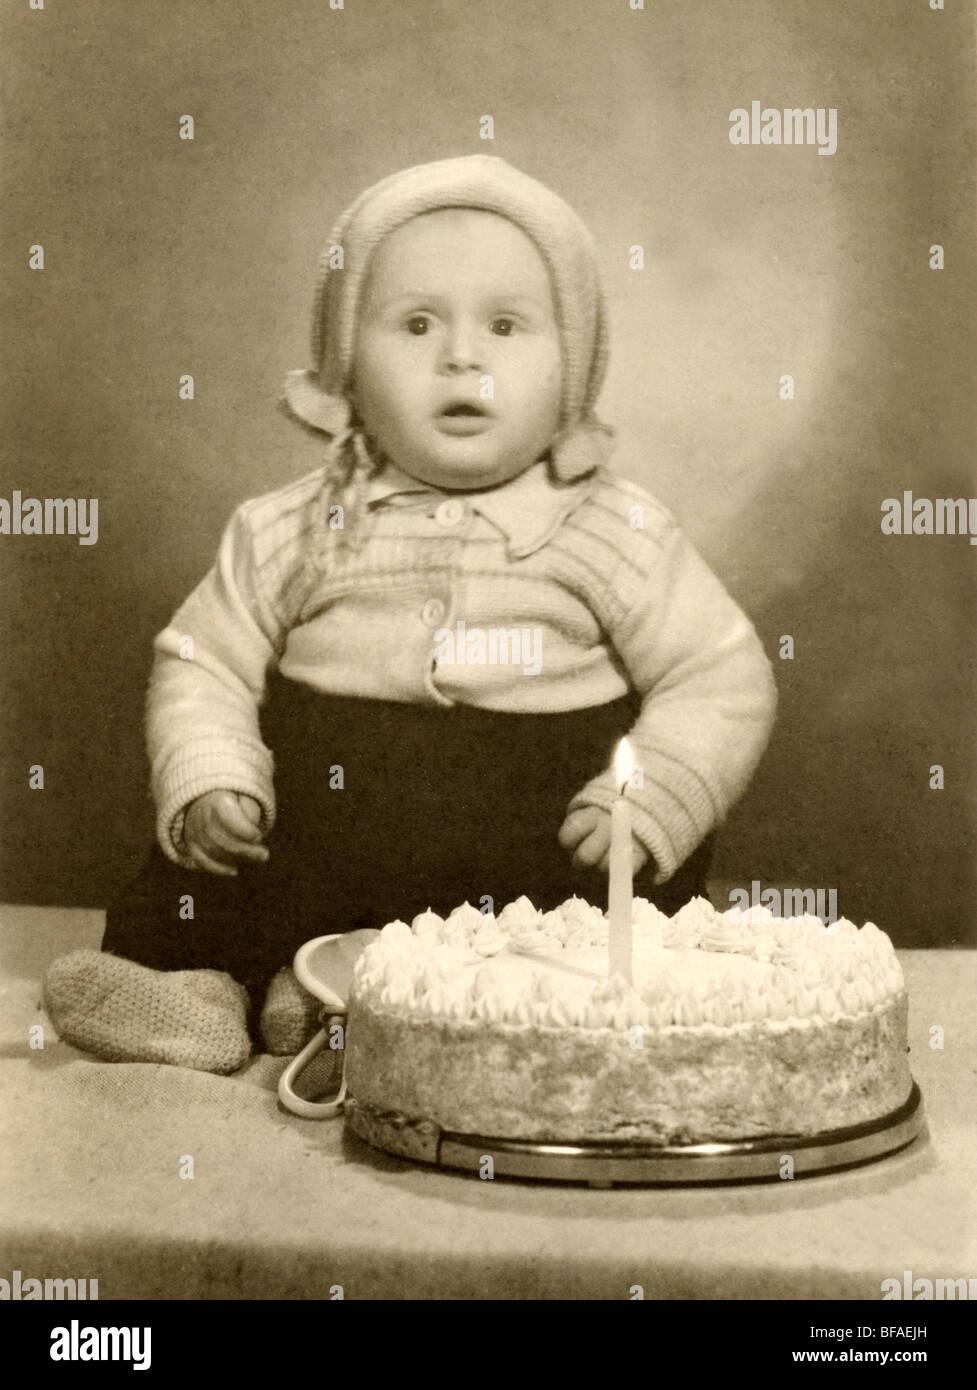 Sensational Vintage Cake Birthday Stock Photos Vintage Cake Birthday Stock Funny Birthday Cards Online Fluifree Goldxyz